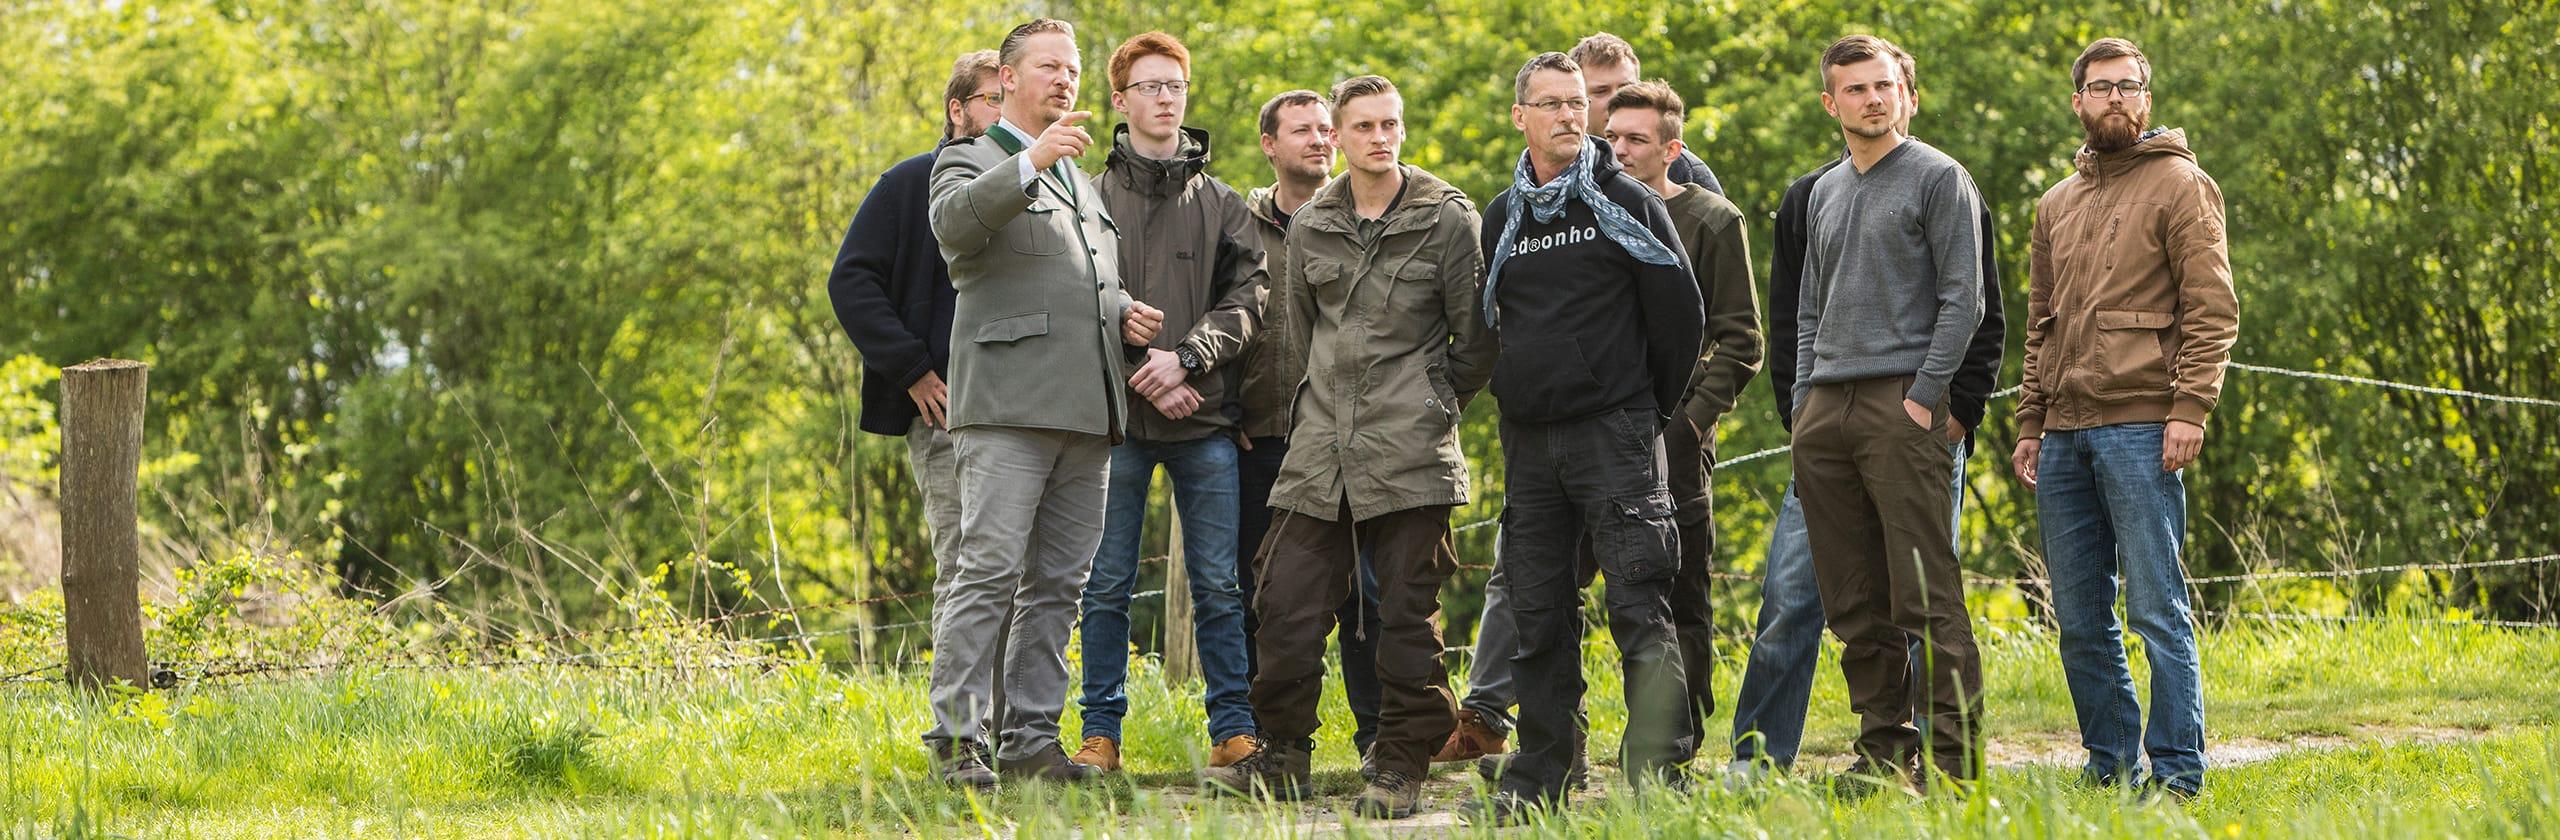 Gruppe Auszubildender mit Gerolf Blittersdorf bei der Jagdausbildung